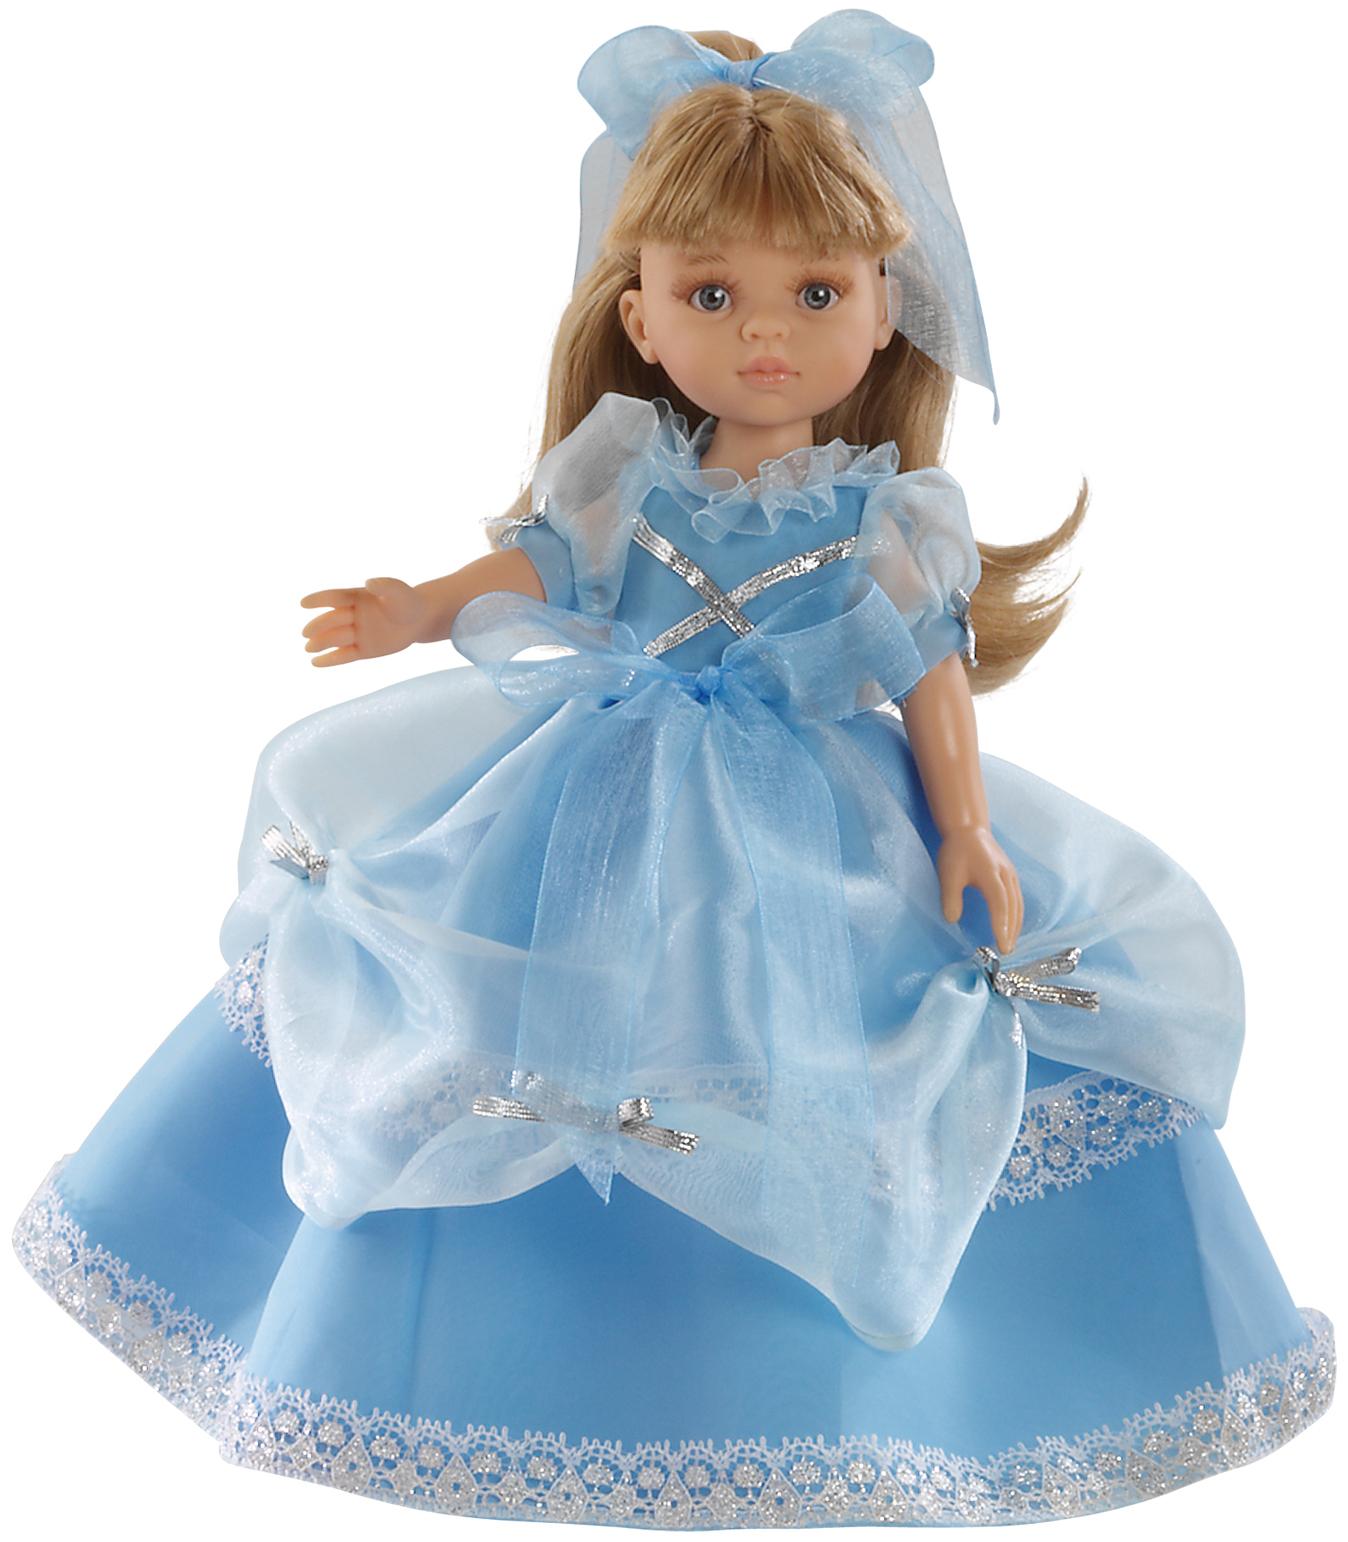 Realistická panenka modrá princezna od Paola Reina ze Španělska (Doprava zdarma)